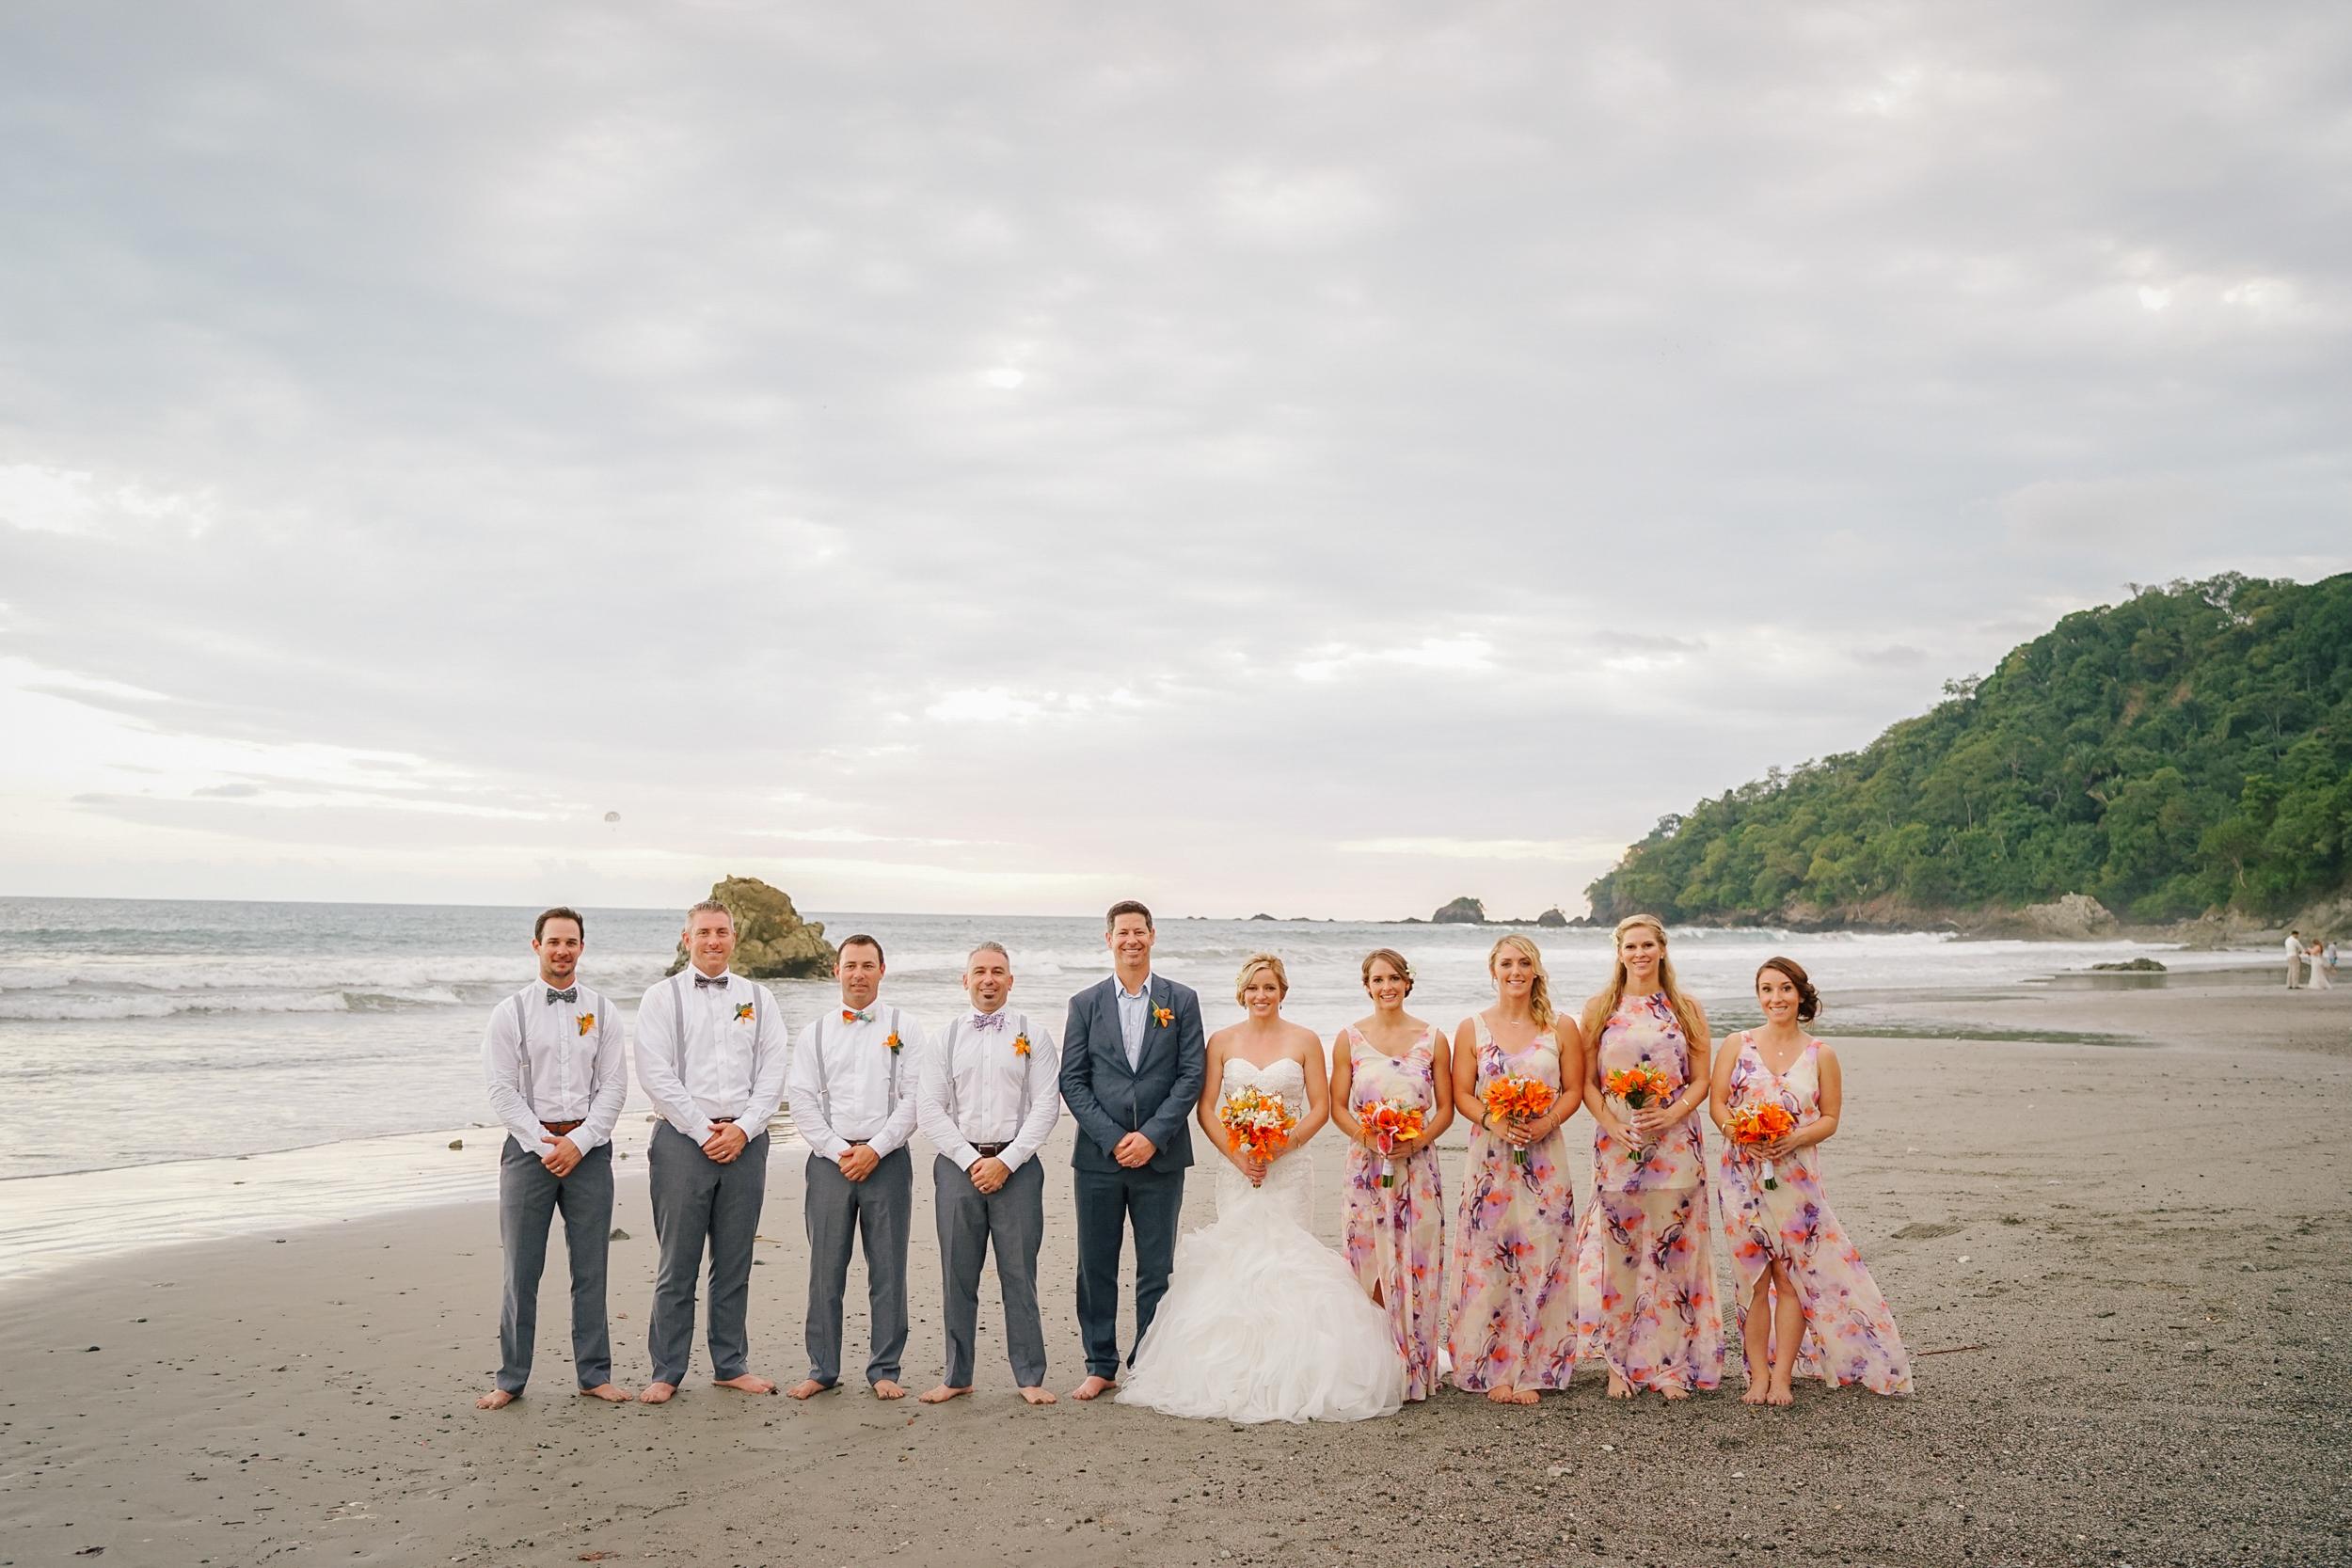 JKP-Destination-Weddings-0080.JPG